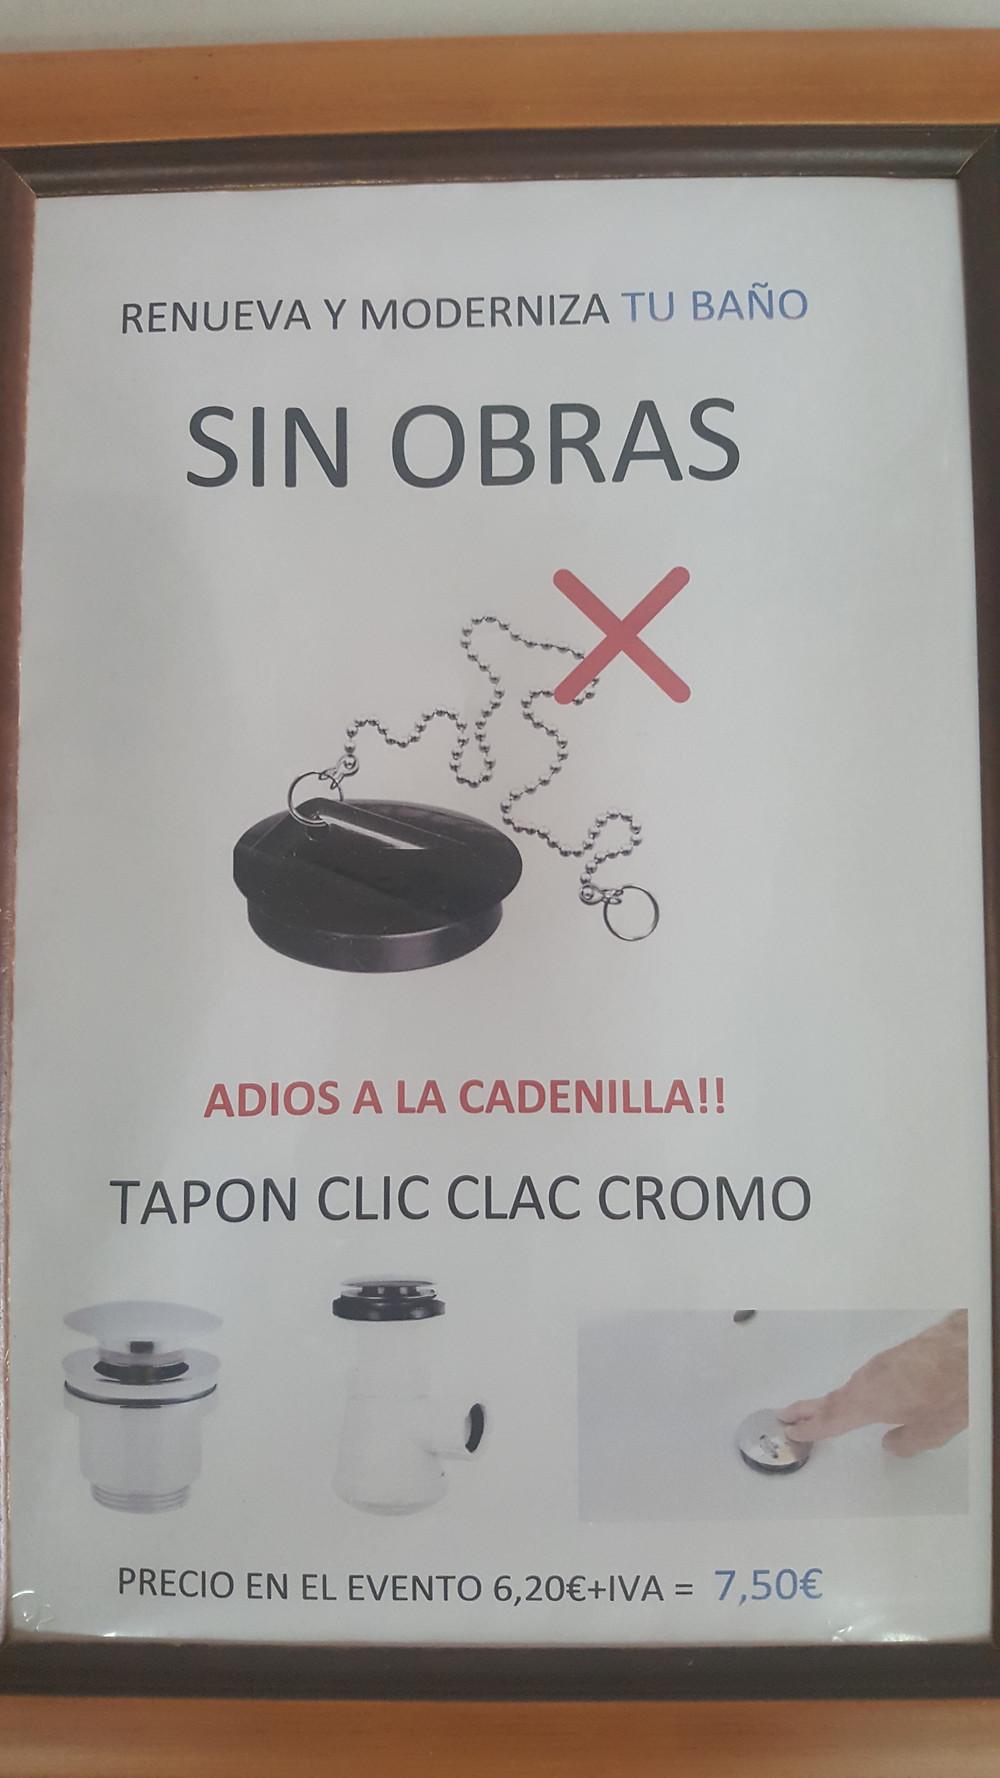 TAPON CLIC CLAC CROMO